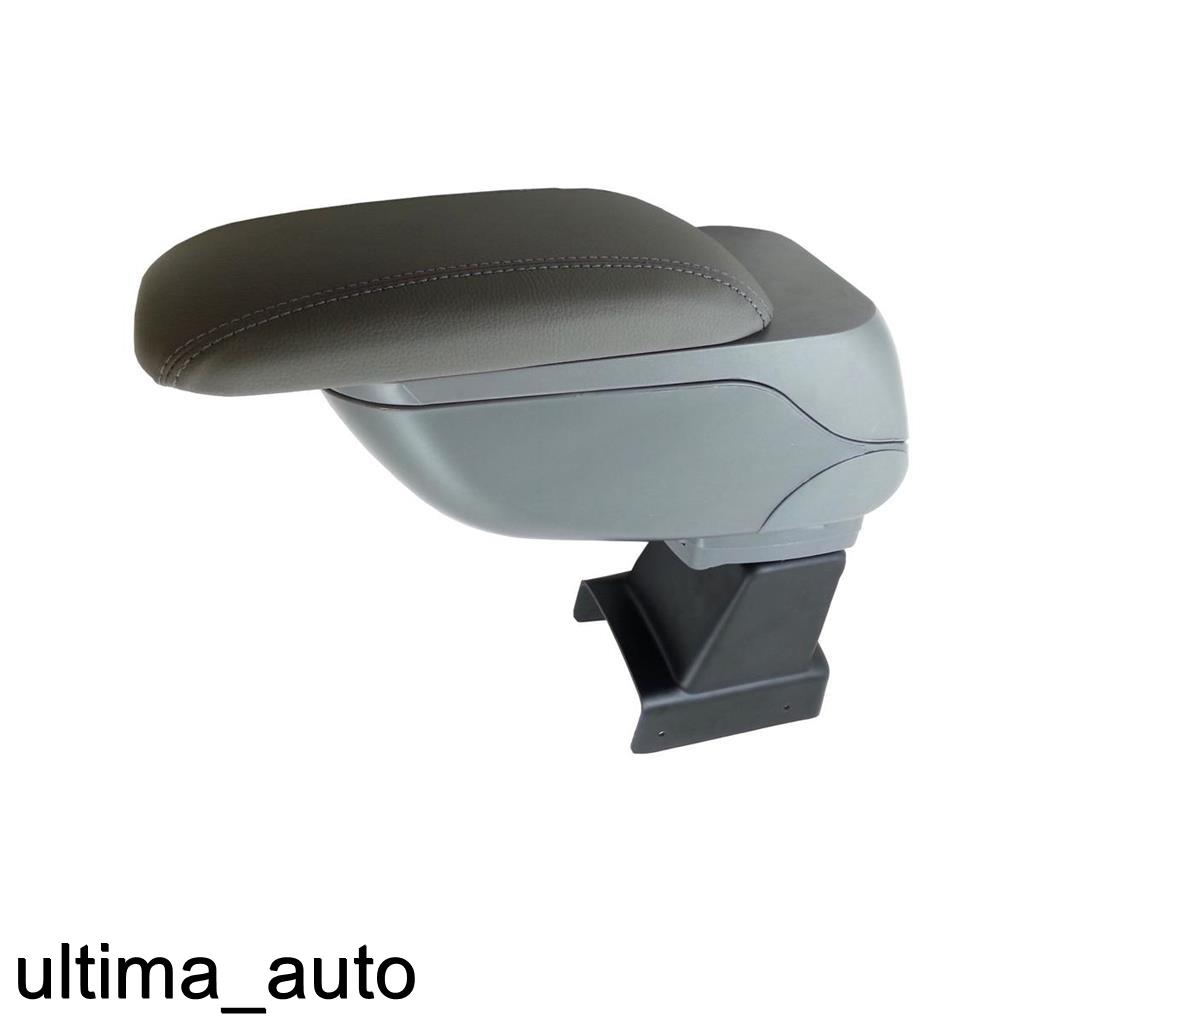 Berluti citroen peugeot partner tepee 08 pelle grigia bracciolo console centrale ebay - Console centrale peugeot partner tepee ...